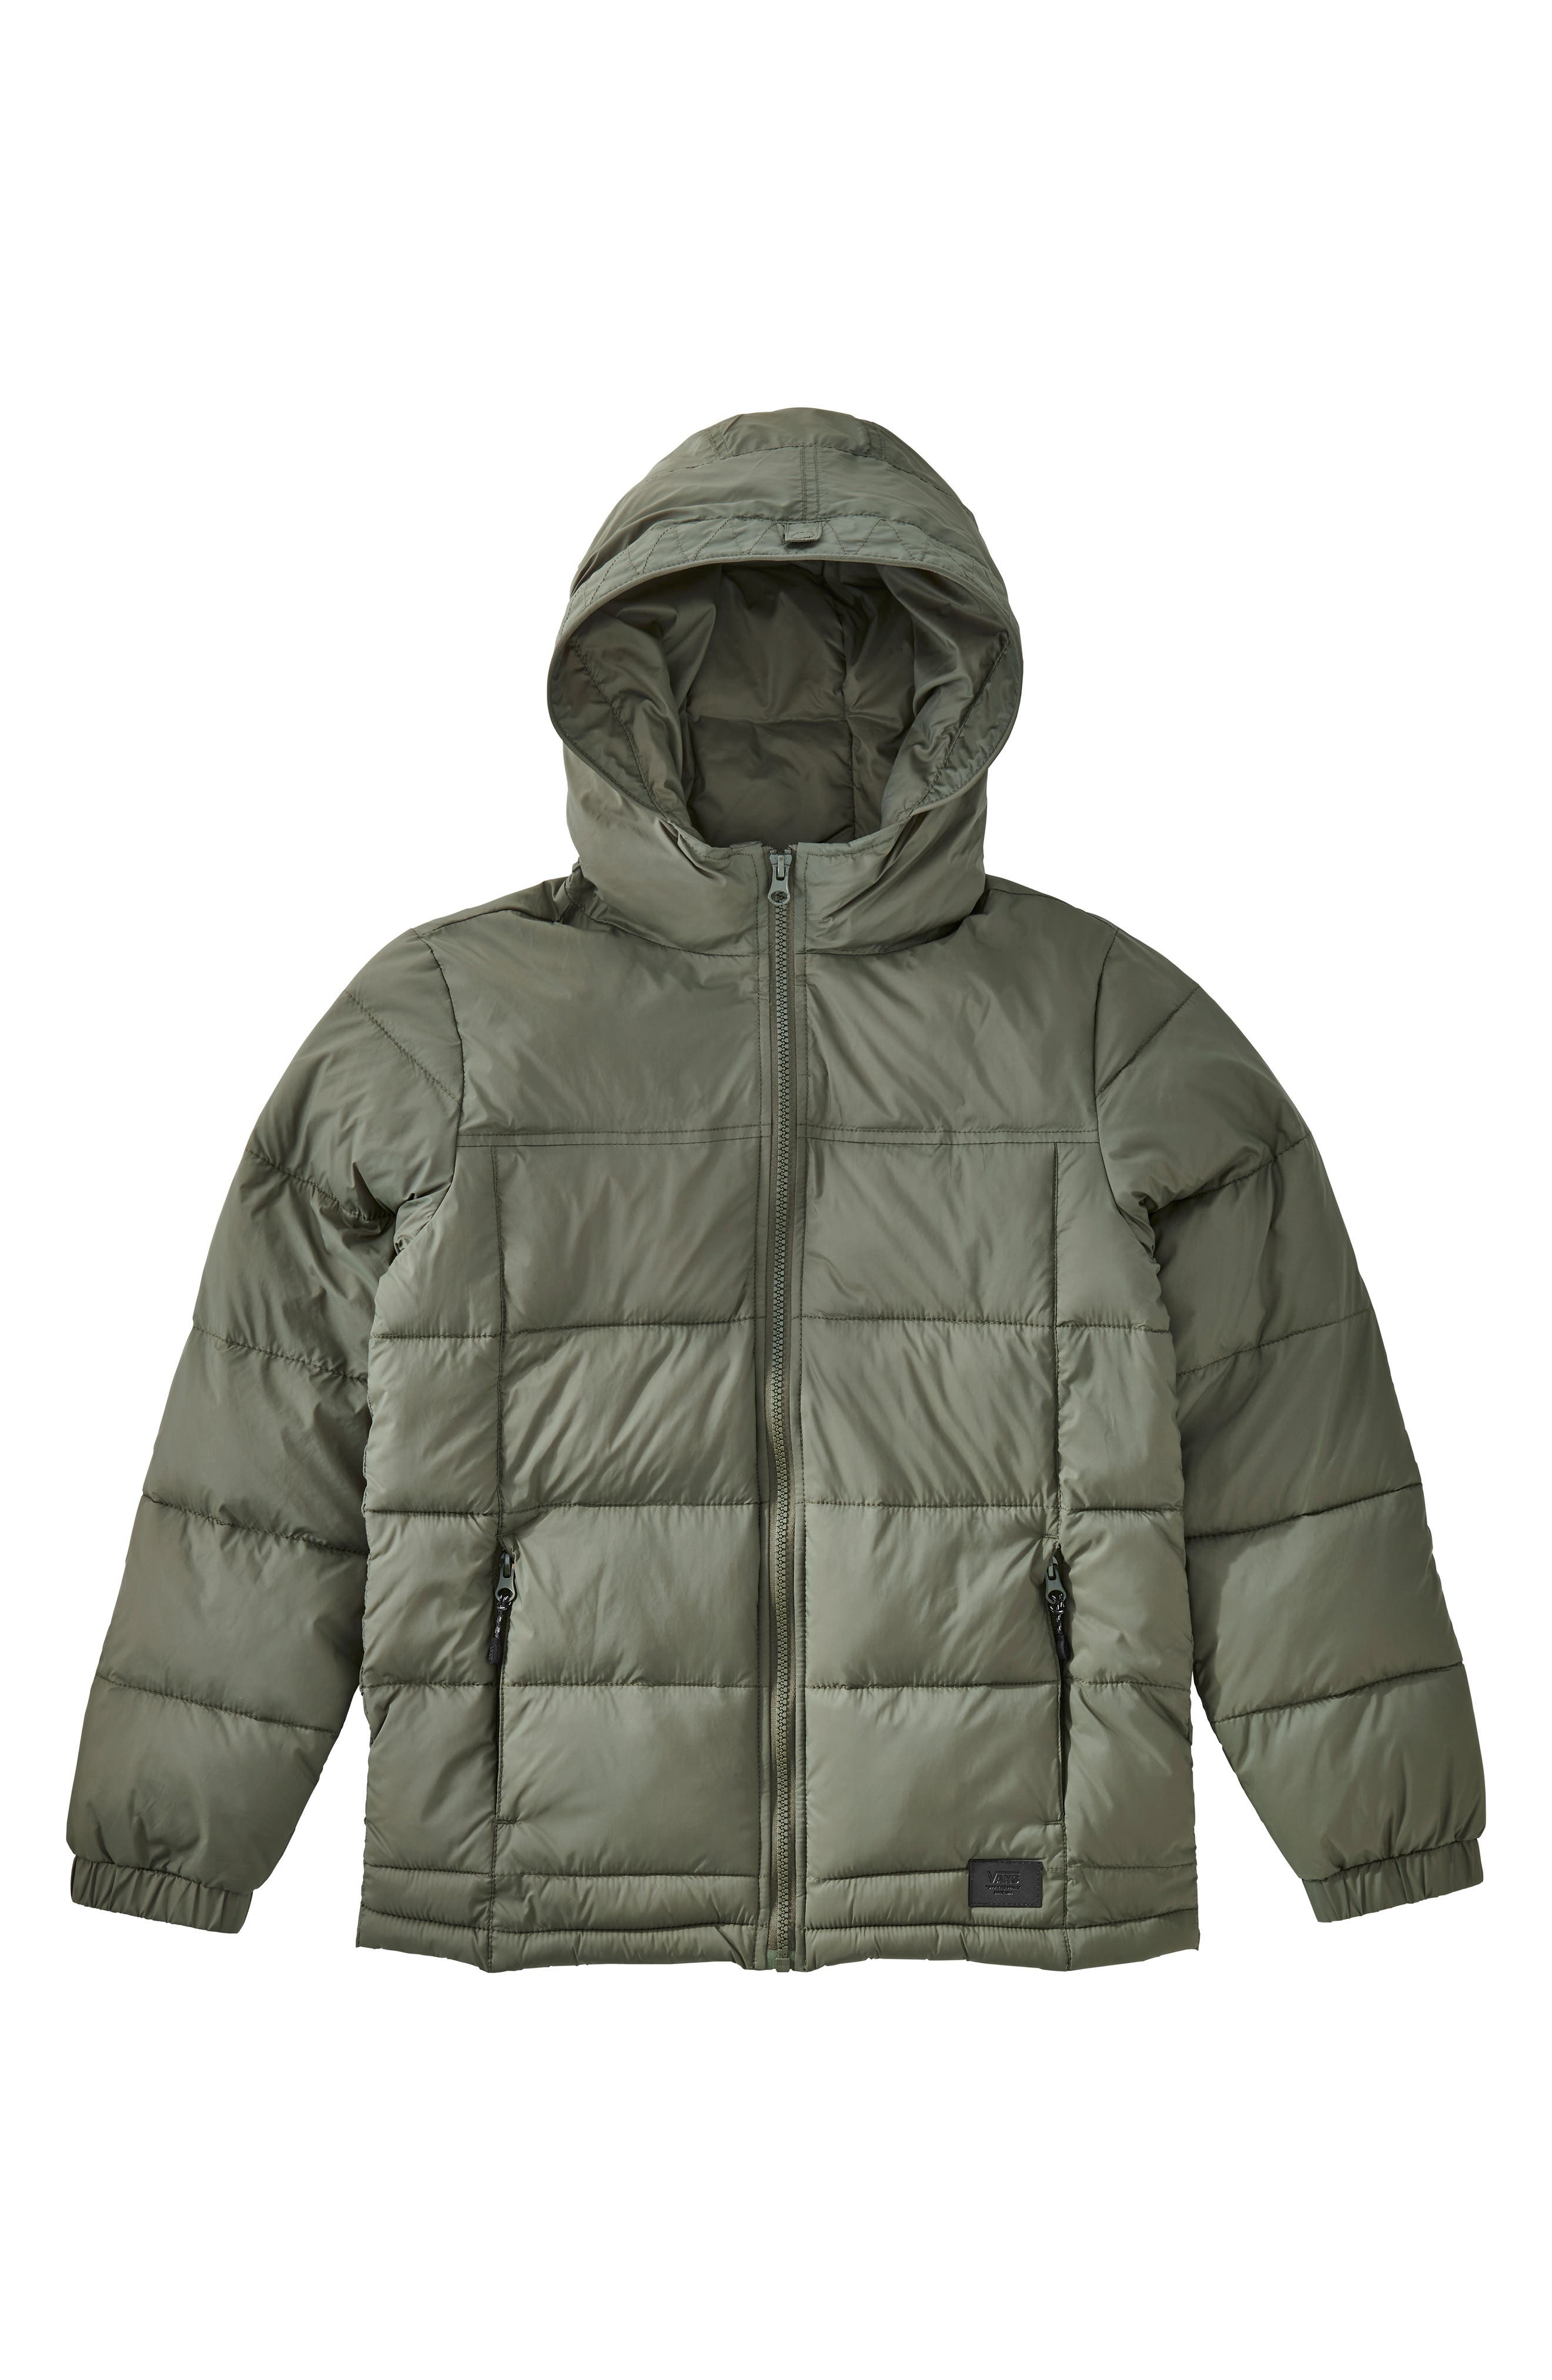 Vans Woodcrest MTE Water Repellent Packaway Puffer Jacket (Big Boys) Boys\u0027 Coats, Jackets \u0026 Outerwear: Fleece Parka | Nordstrom